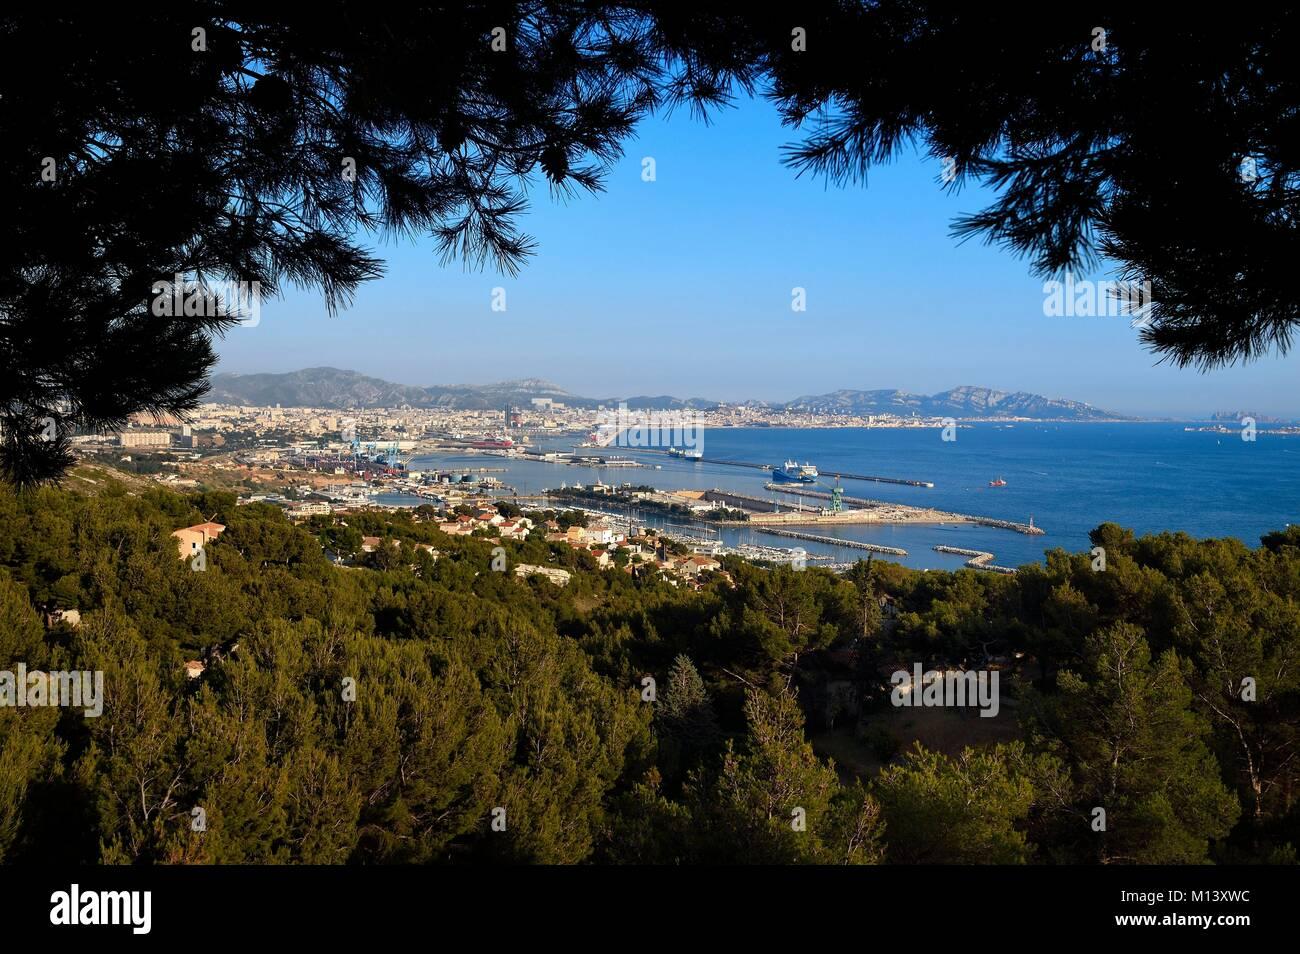 France, Bouches du Rhone, Marseille, Grand Port Maritime de Marseille or GPMM, East Basin, Marina Estaque Stock Photo